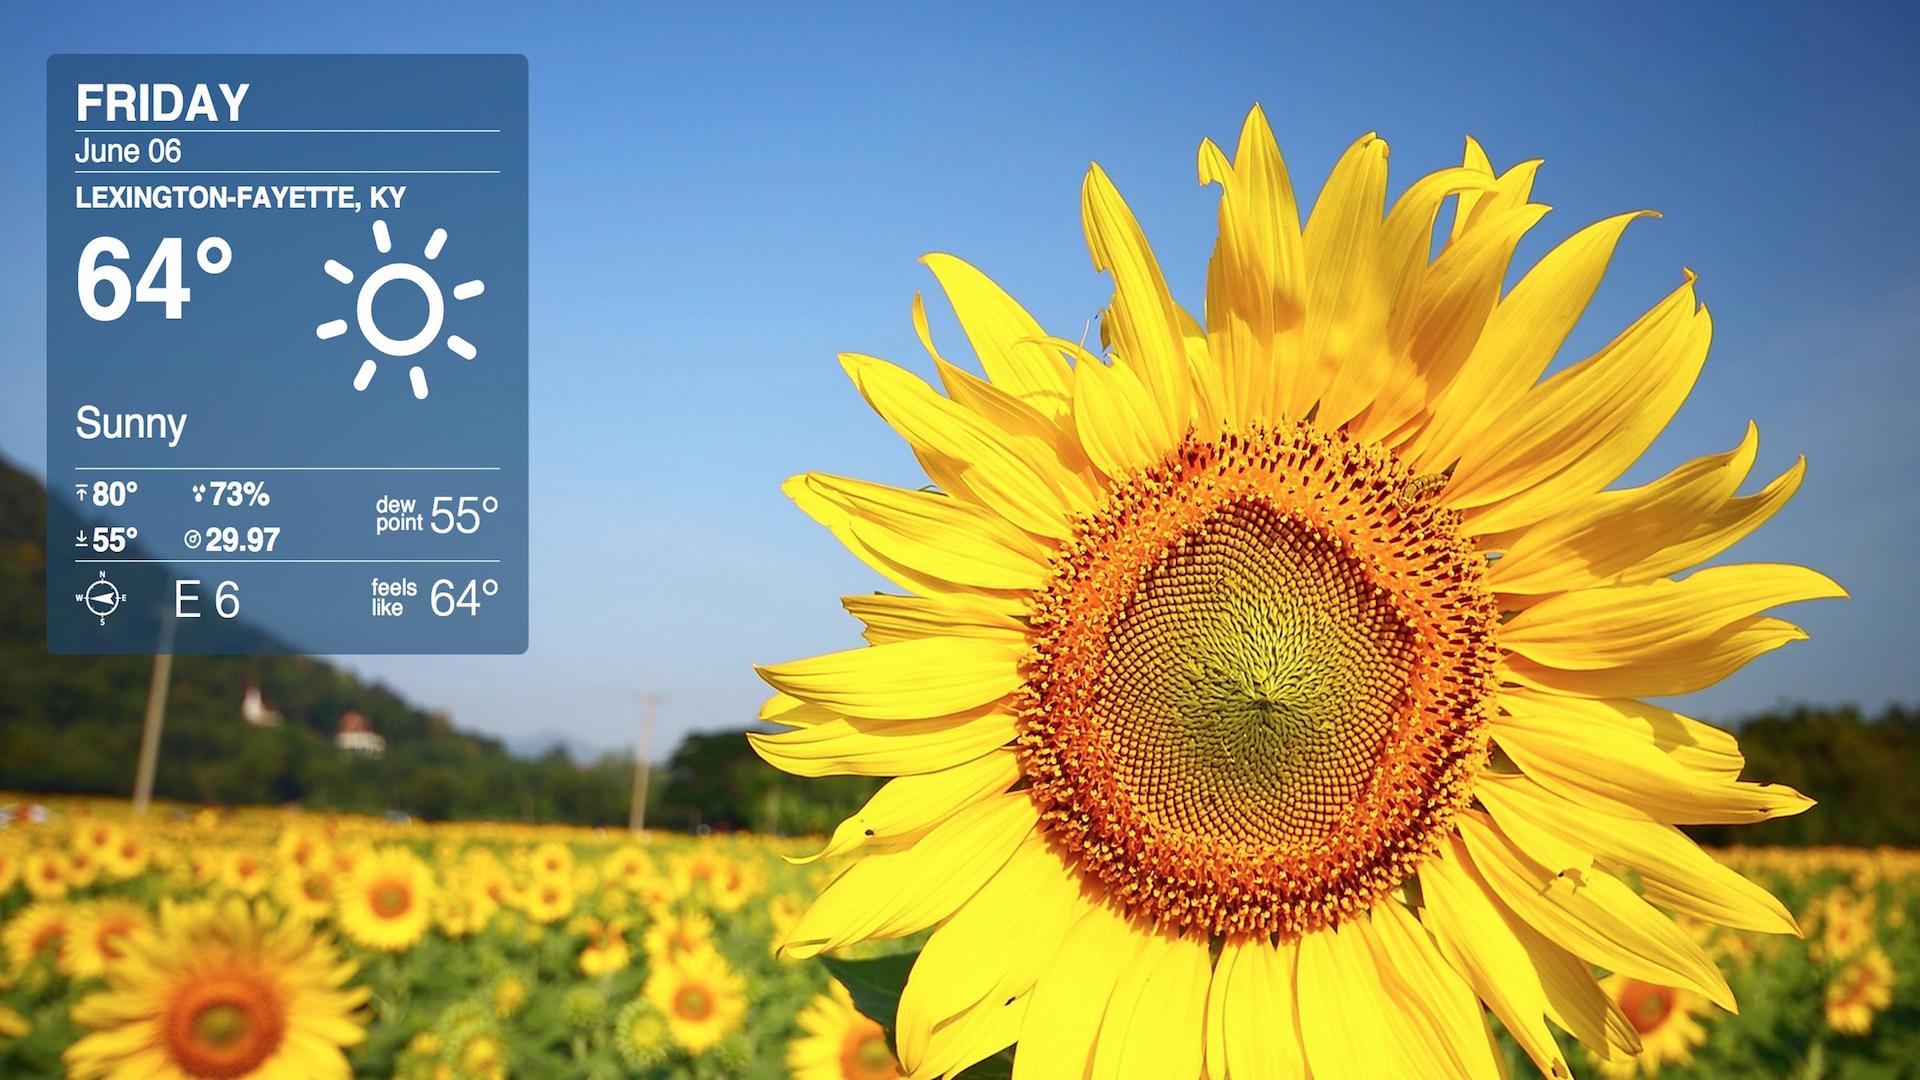 Screen Shot 2014-06-06 at 8.58.40 AM.jpg